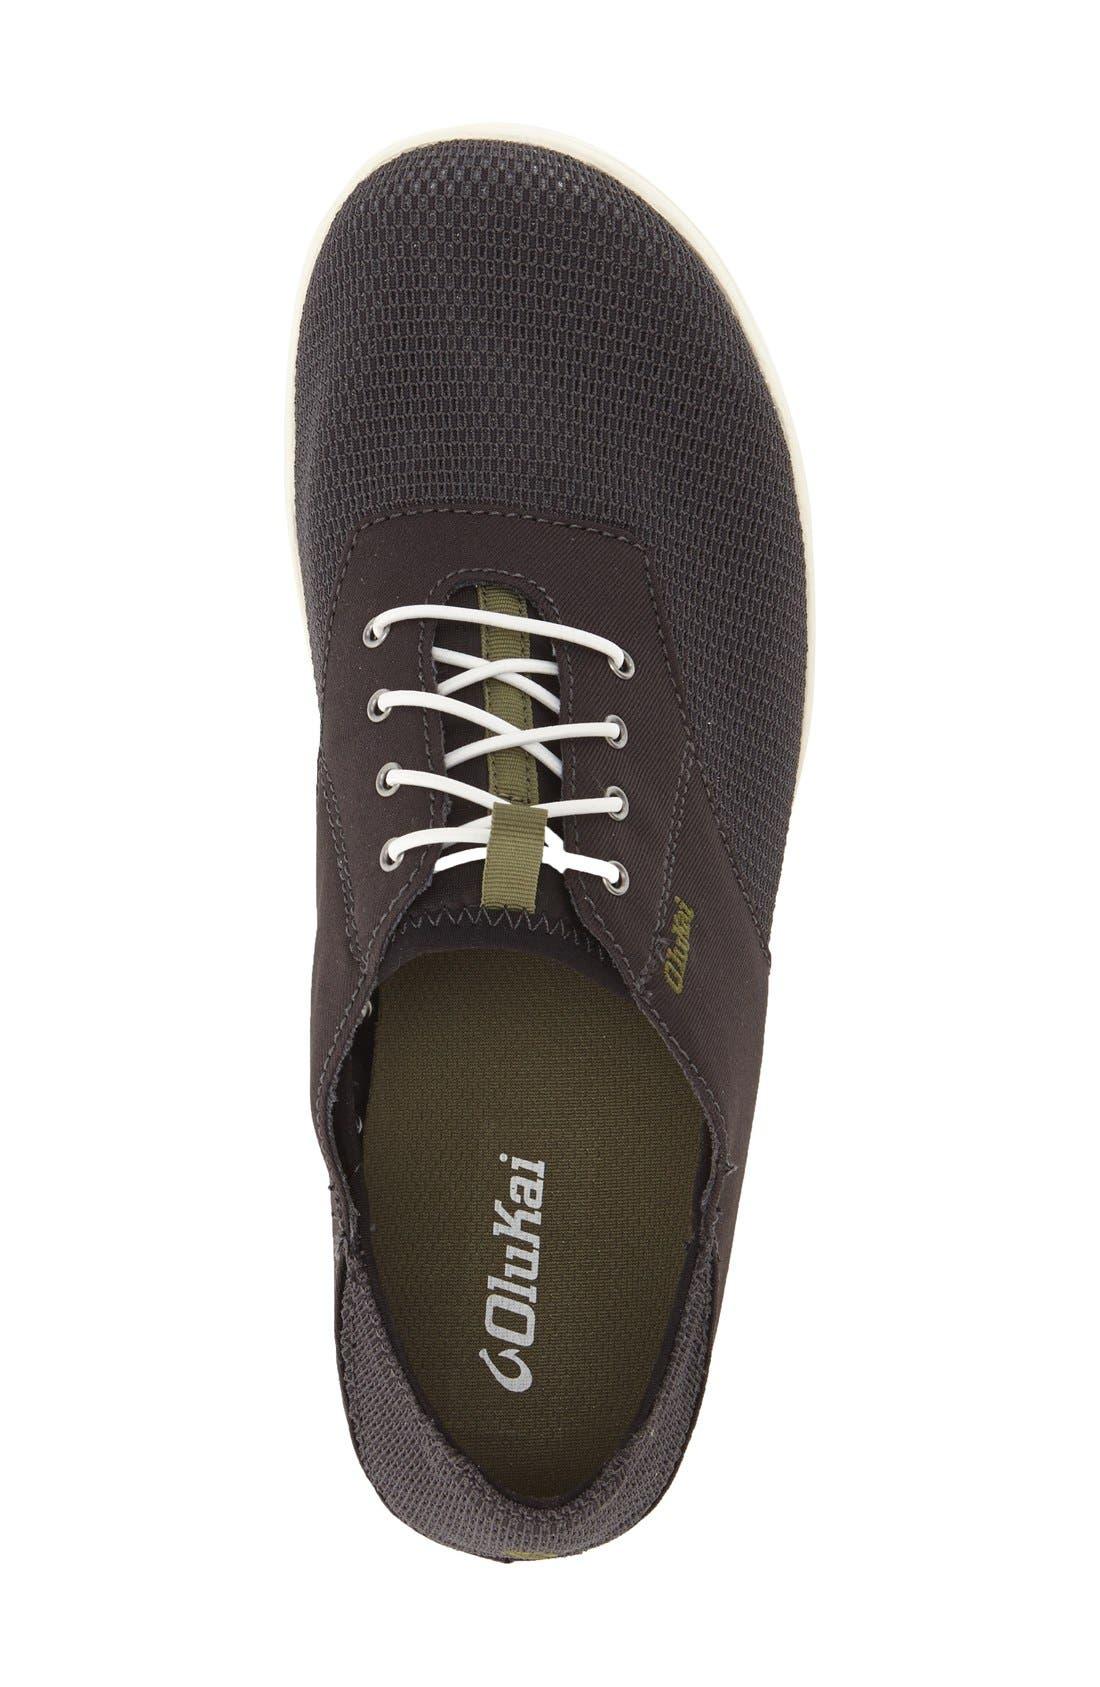 Nohea Moku Sneaker,                             Alternate thumbnail 3, color,                             BLACK/ BLACK